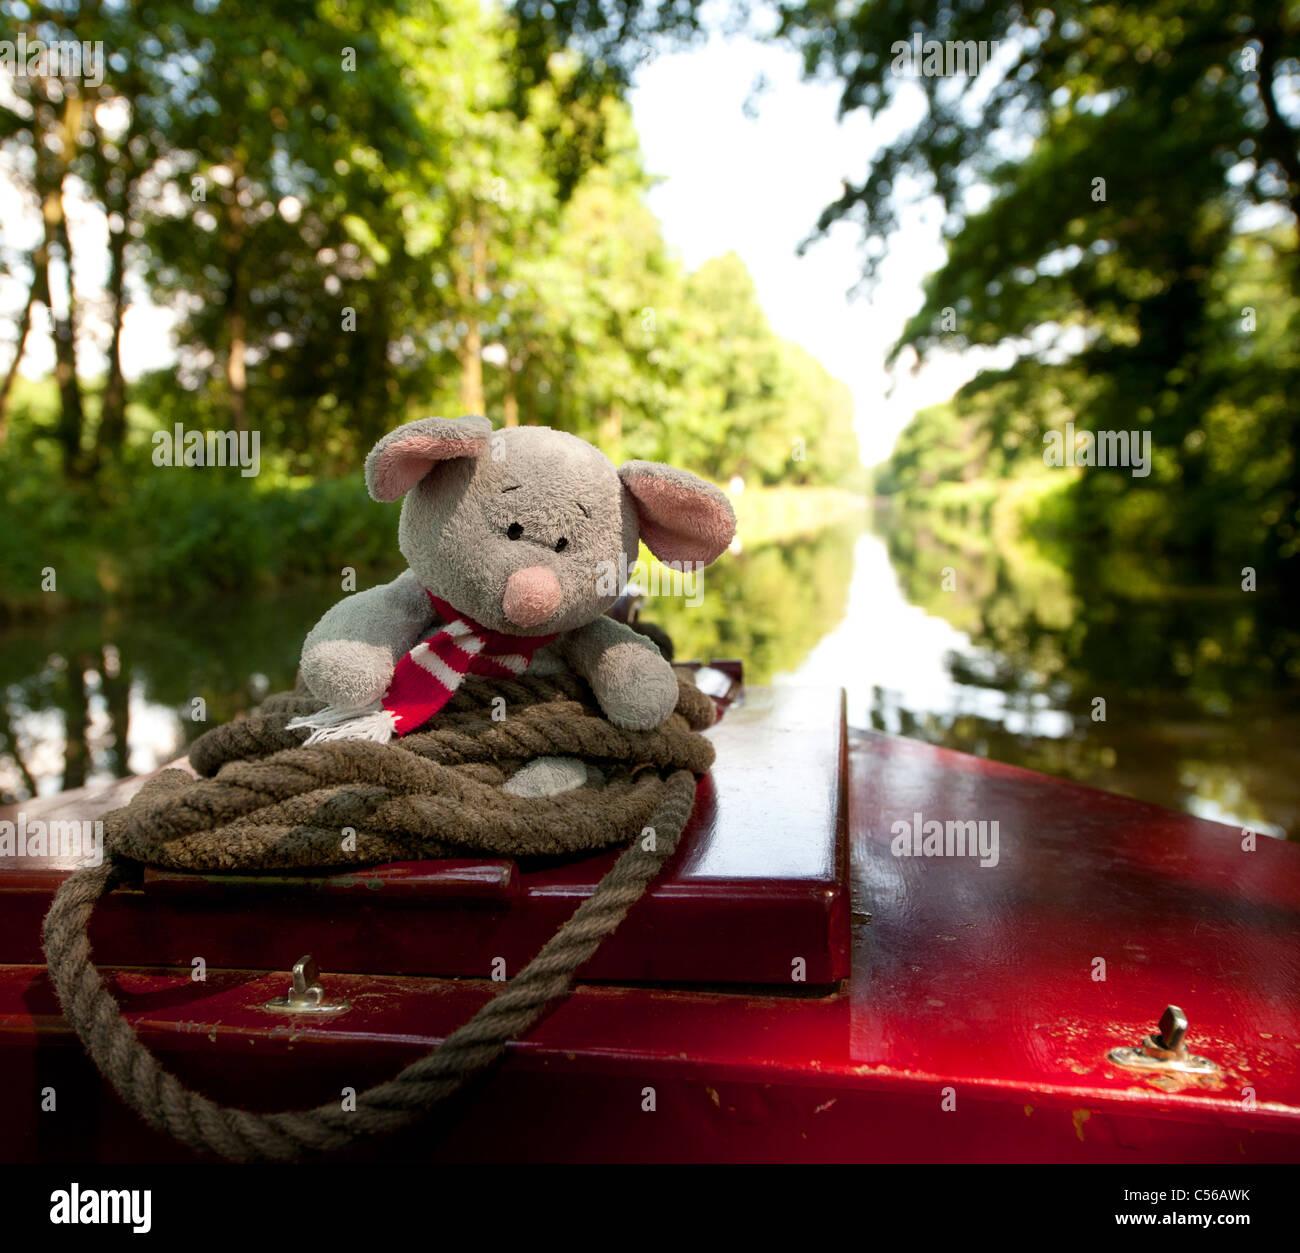 People having fun on the River Wey Navigations near Godalming Surrey, UK - Stock Image